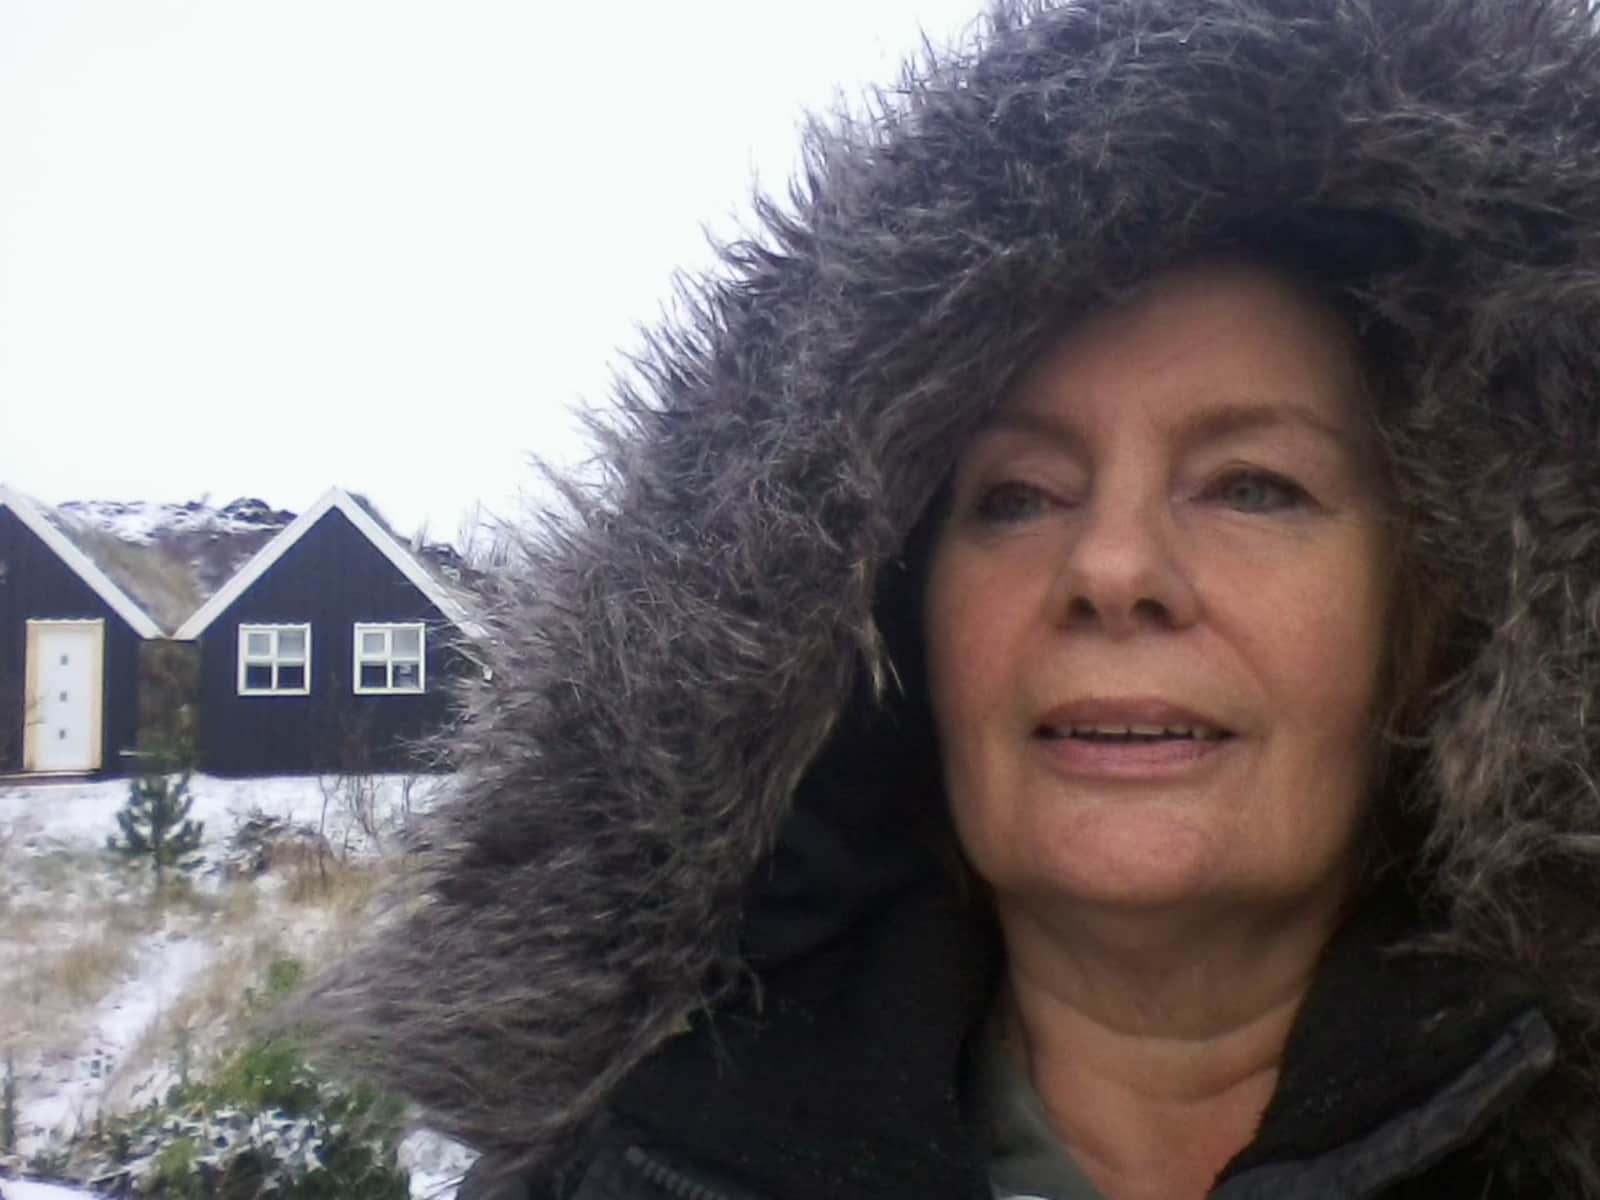 Kristin from Reykjavík, Iceland